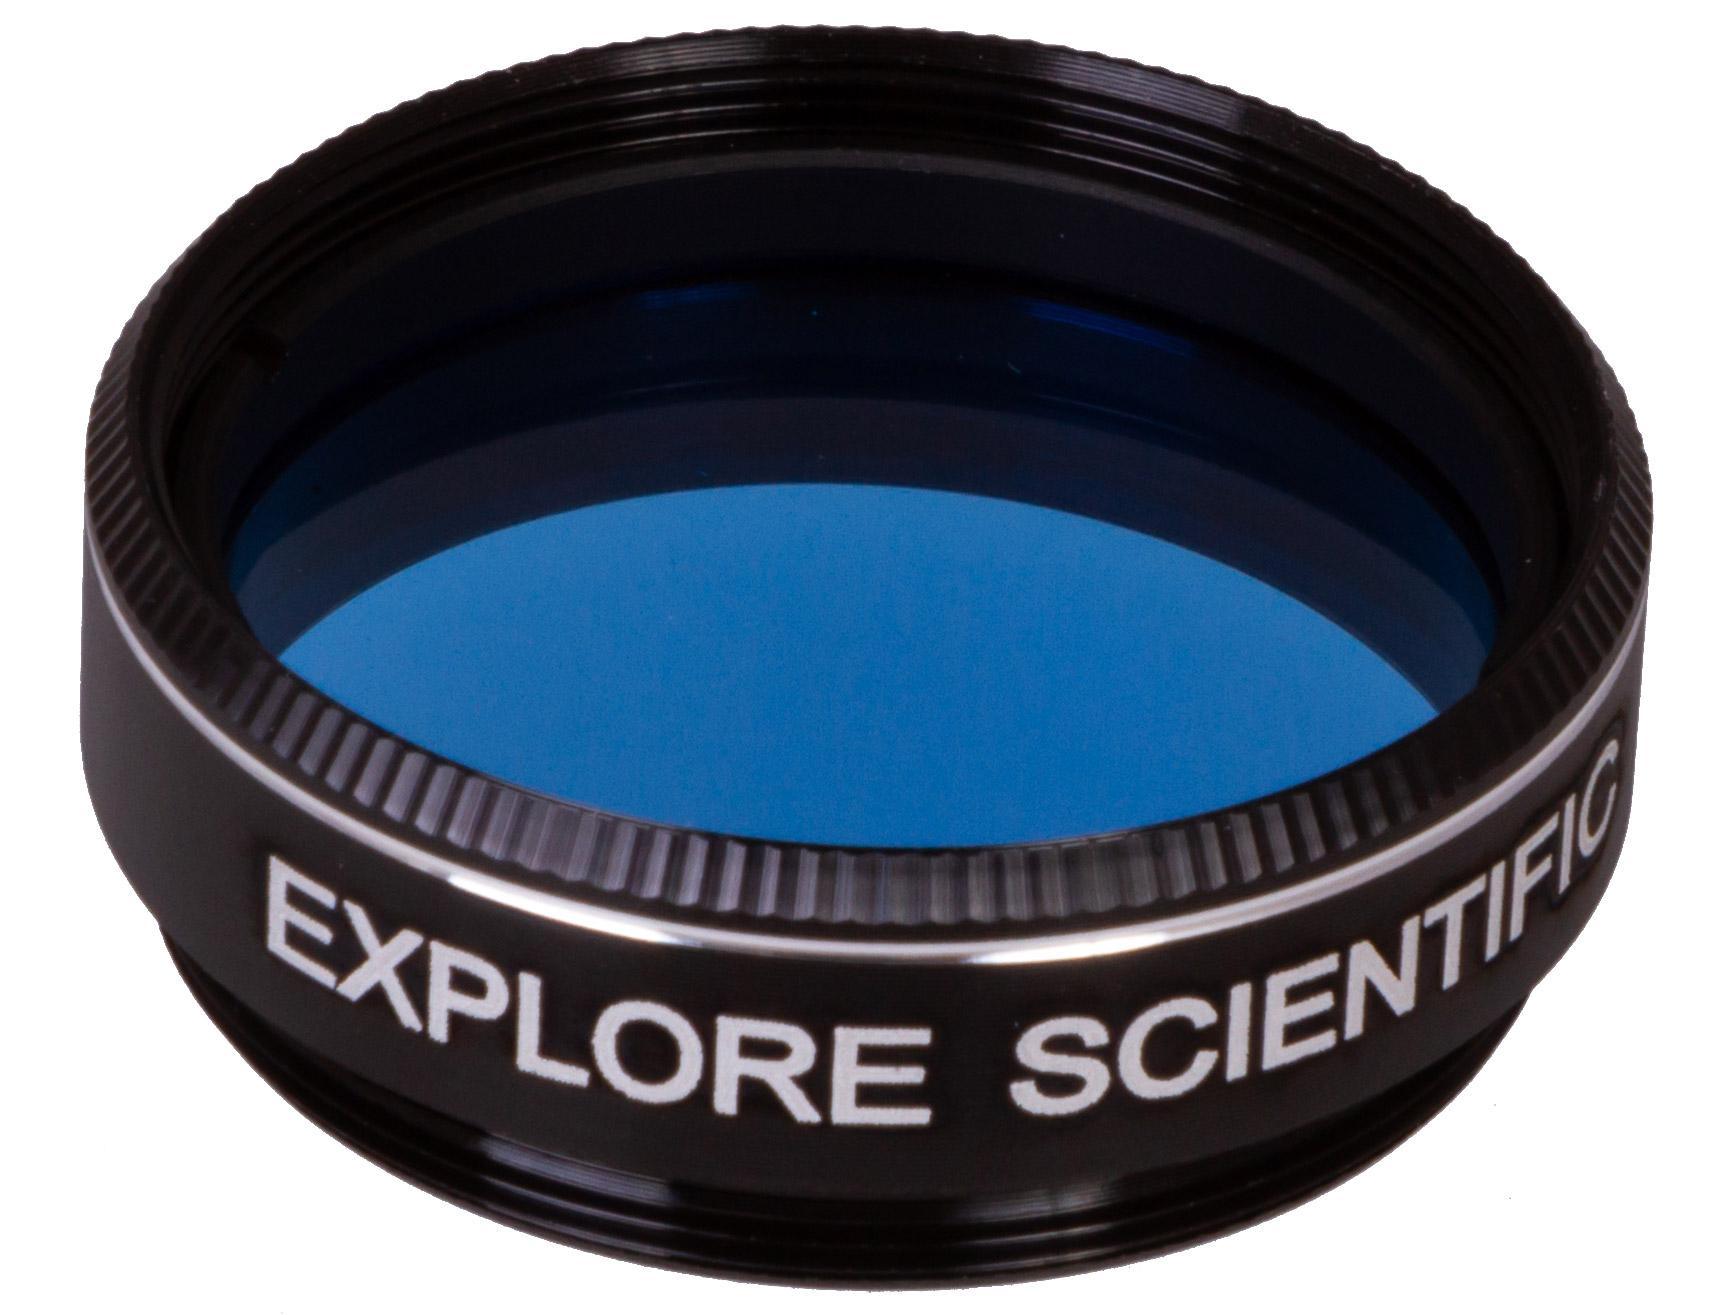 Светофильтр Explore Scientific светло синий №82A, 1,25